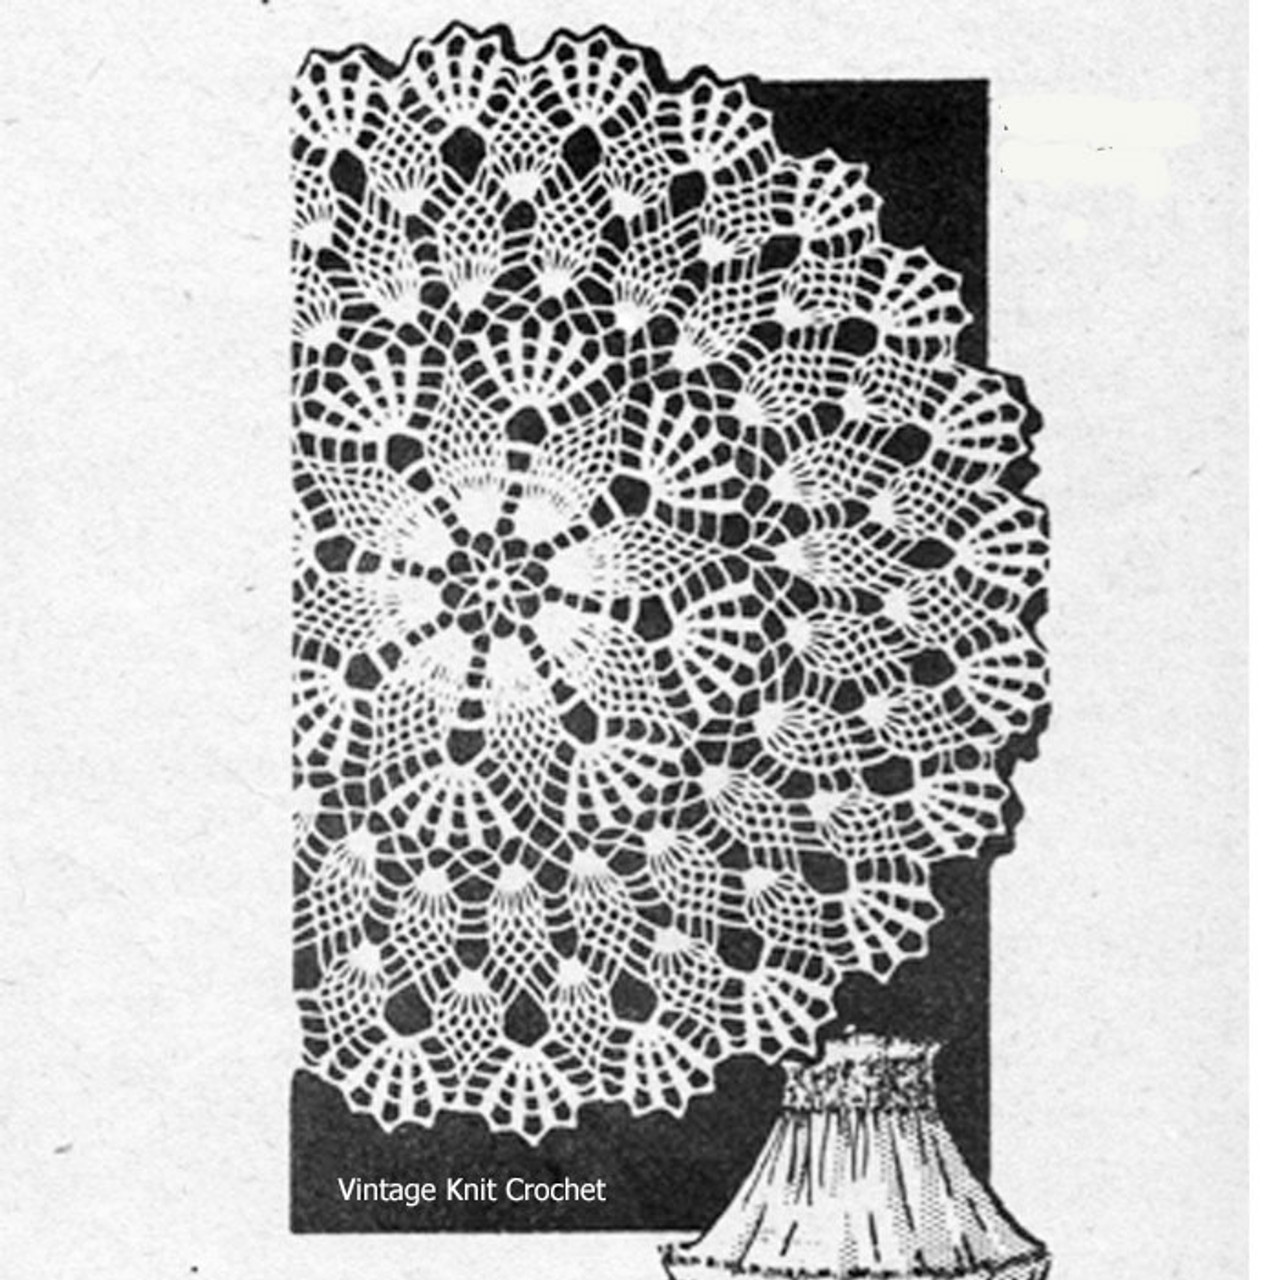 Centerpiece Pineapple Crochet doily Pattern, American Weekly 3136